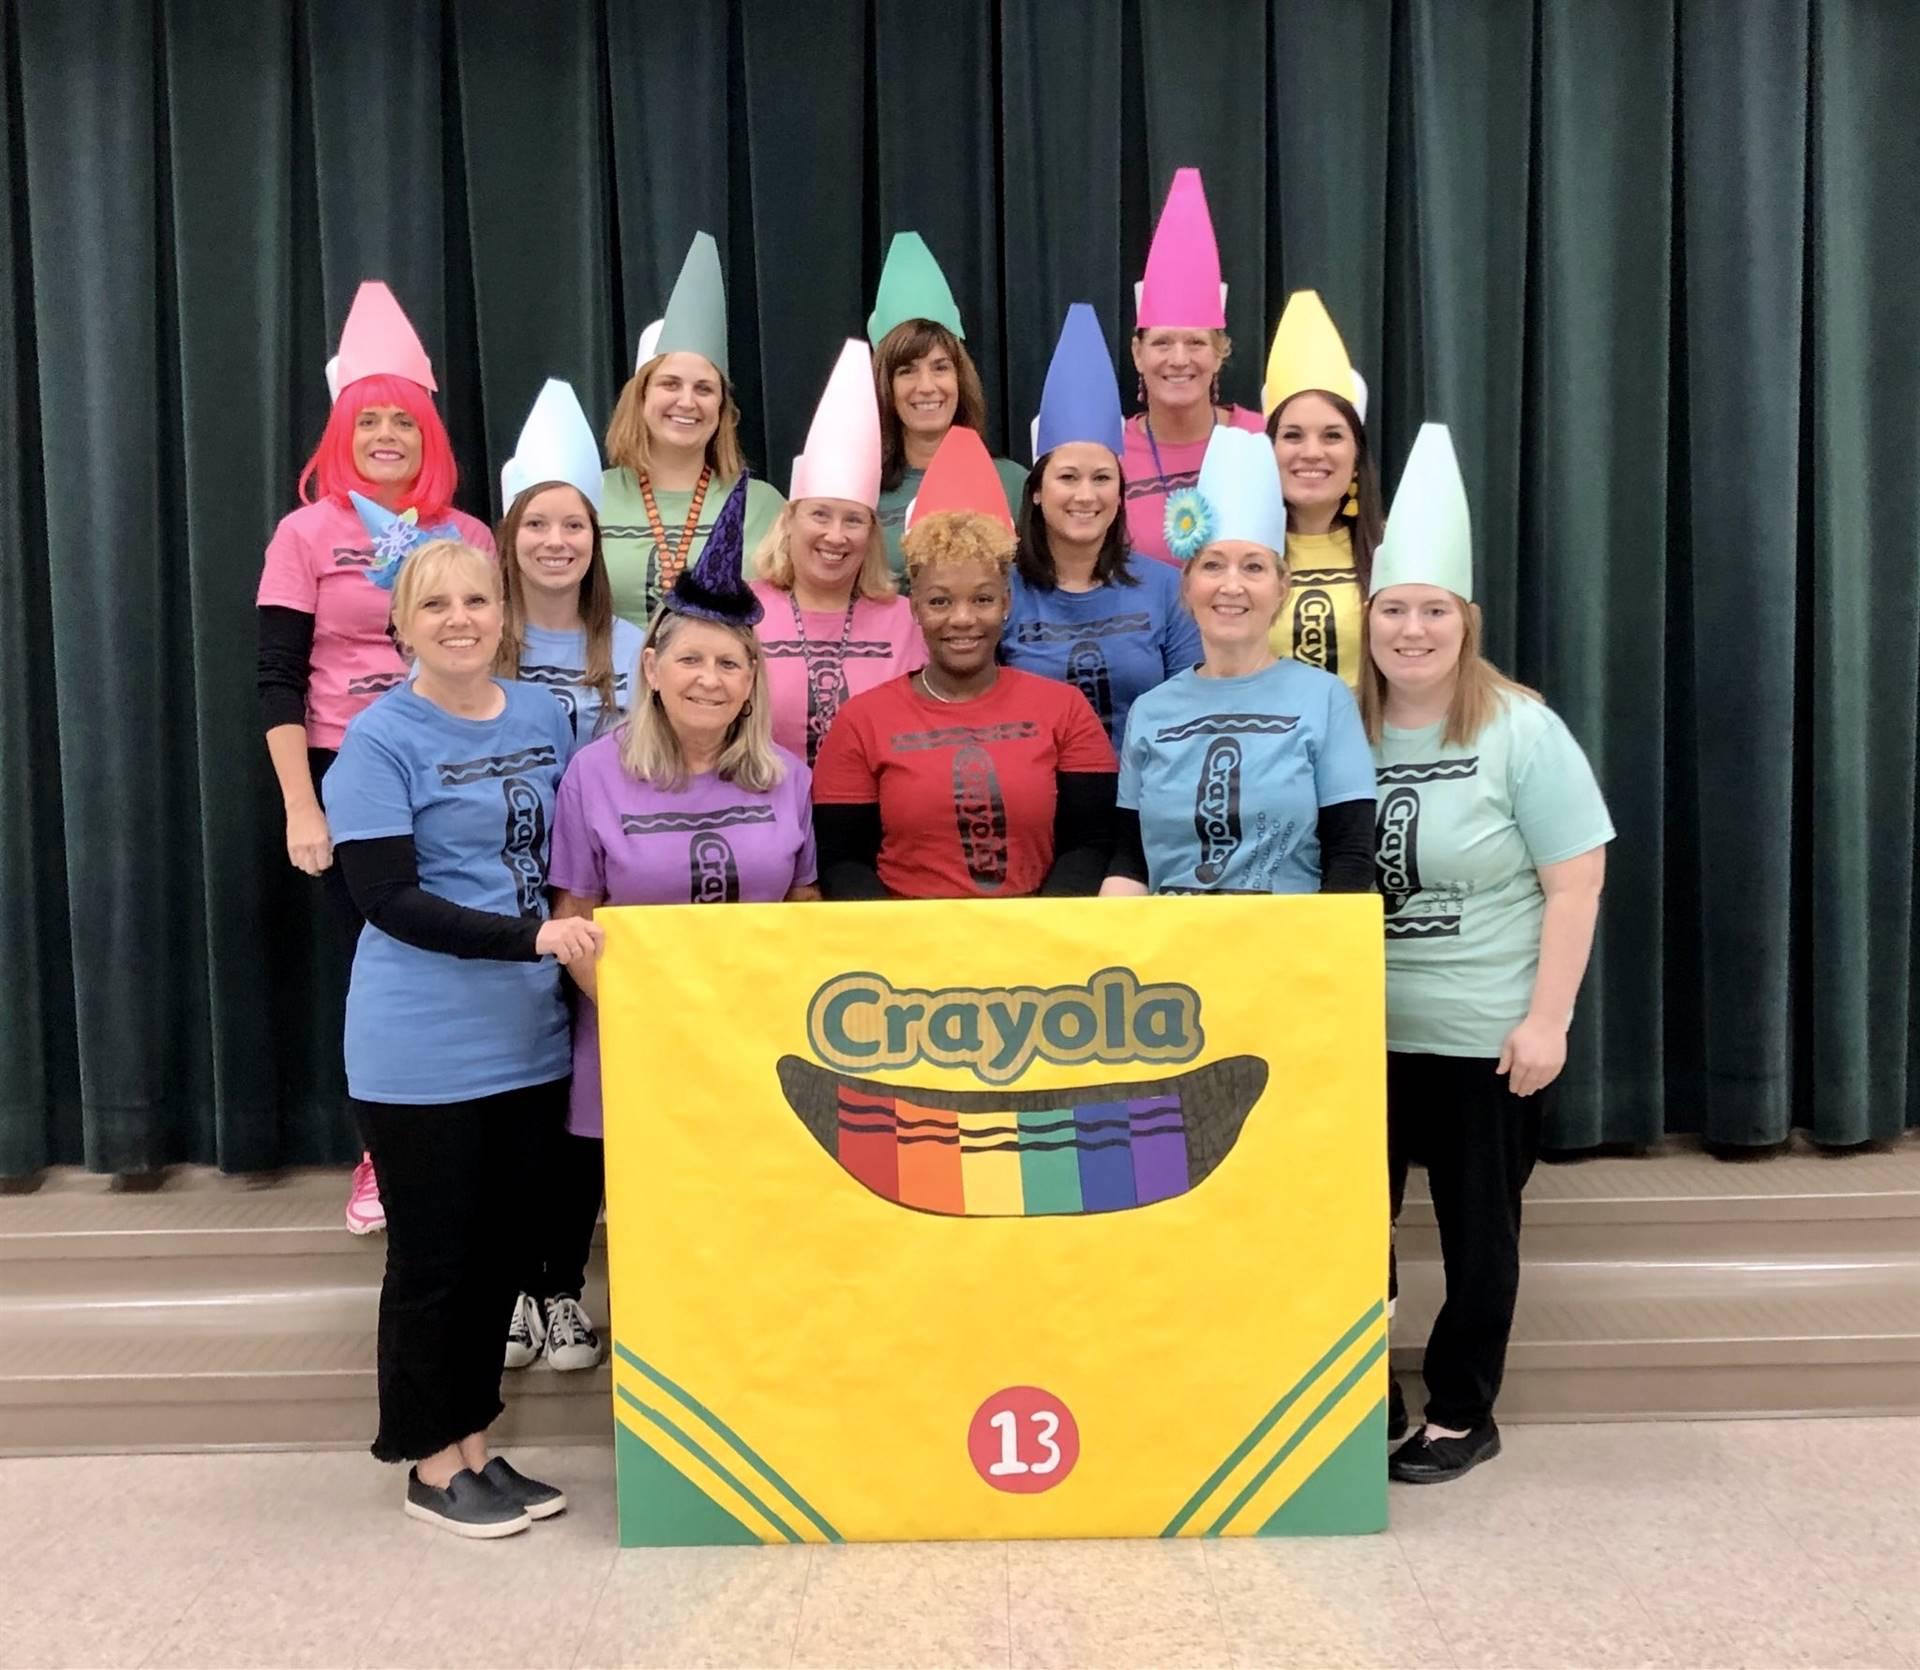 staff dressed like Crayola Crayons